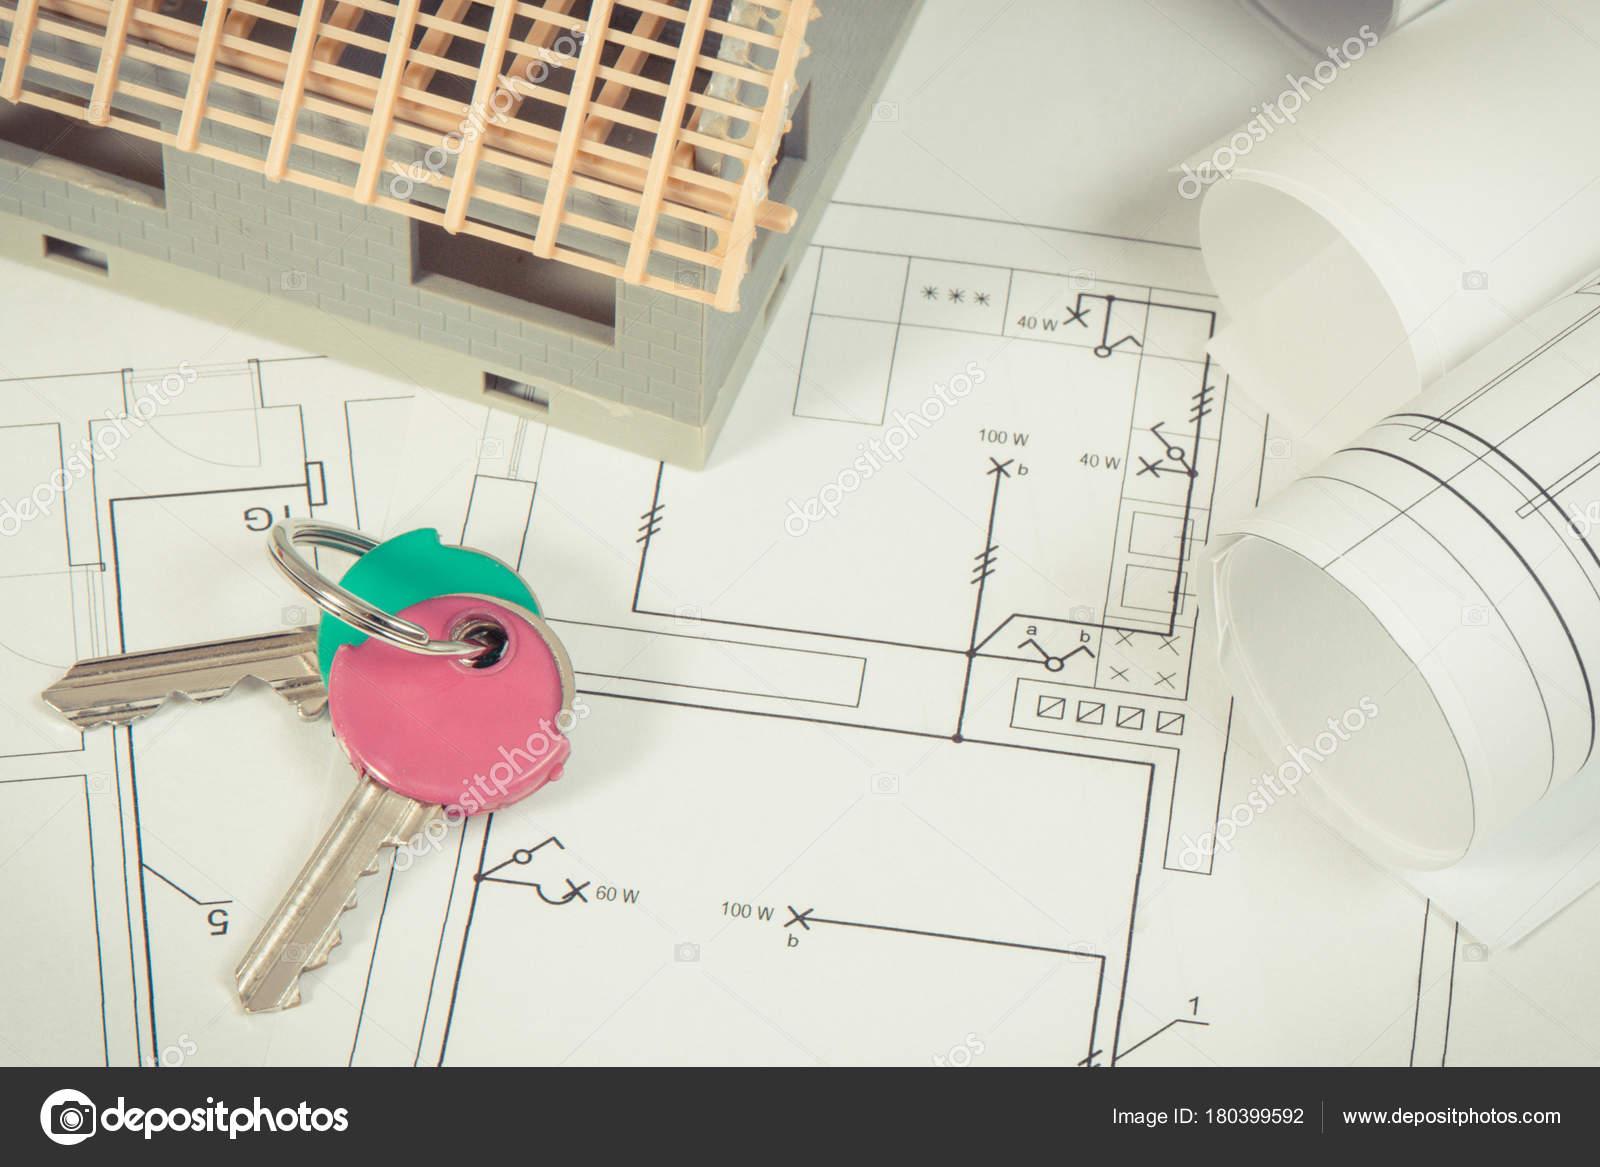 Schemi Elettrici : Chiavi di casa casa in costruzione e schemi elettrici per lavori